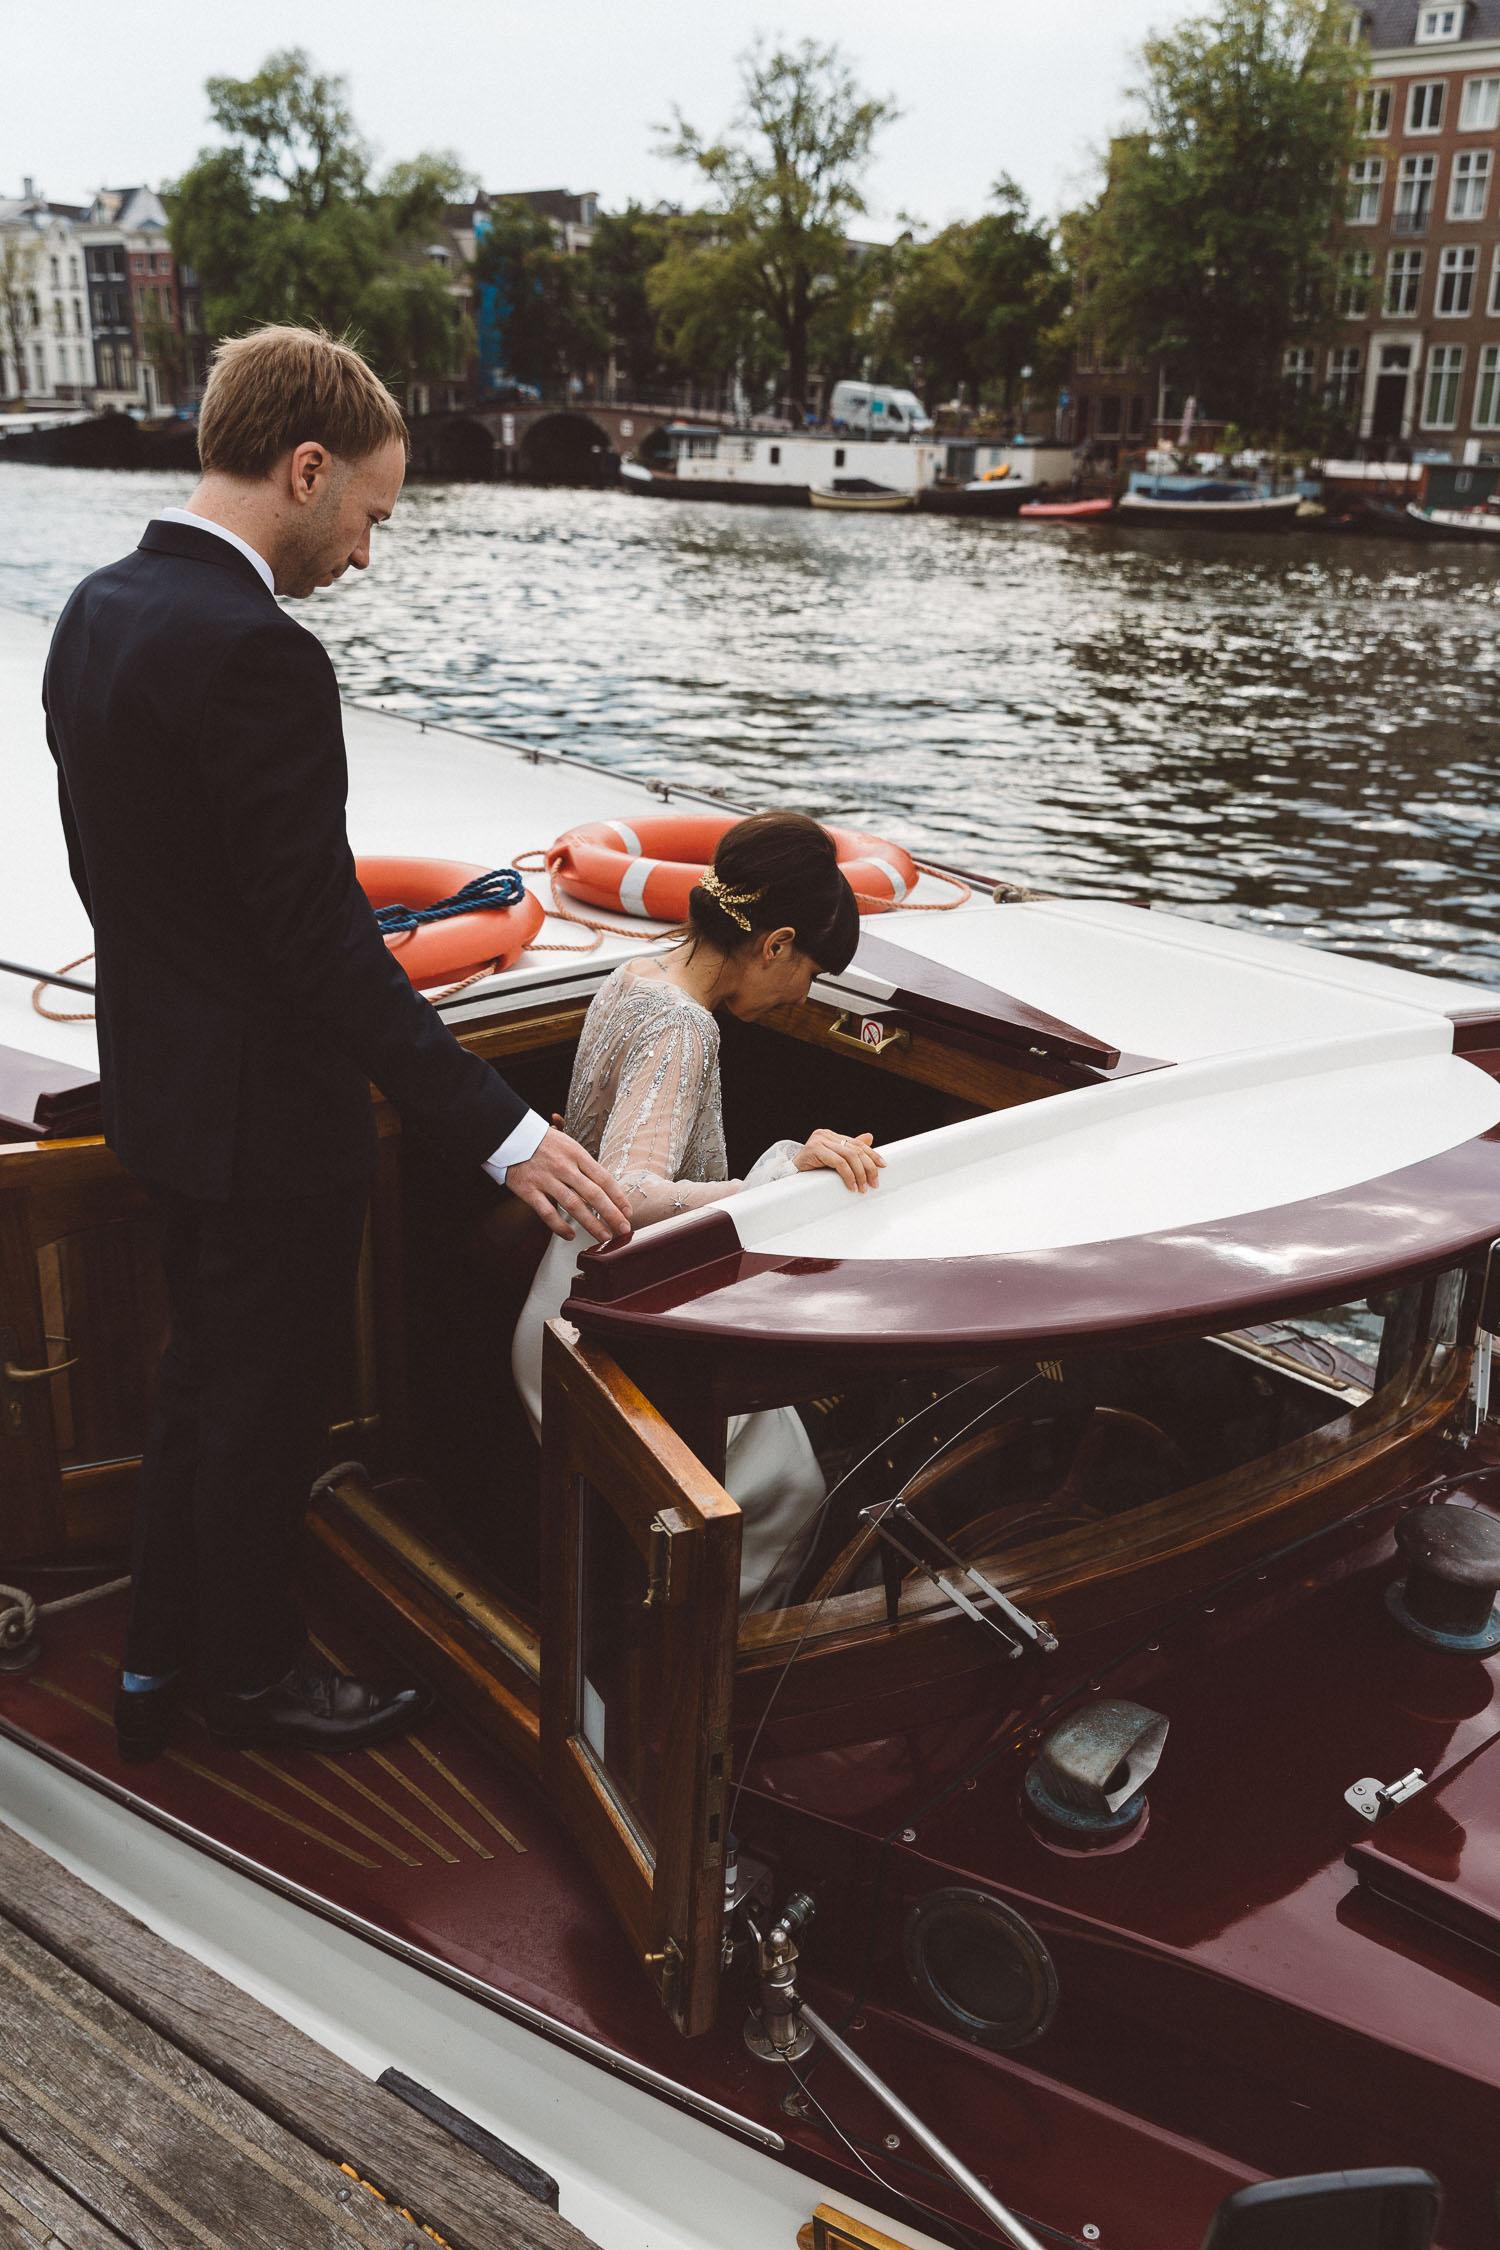 Wedding-James-and-Tiffany-photography-On-a-hazy-morning-Amsterdam-228.jpg